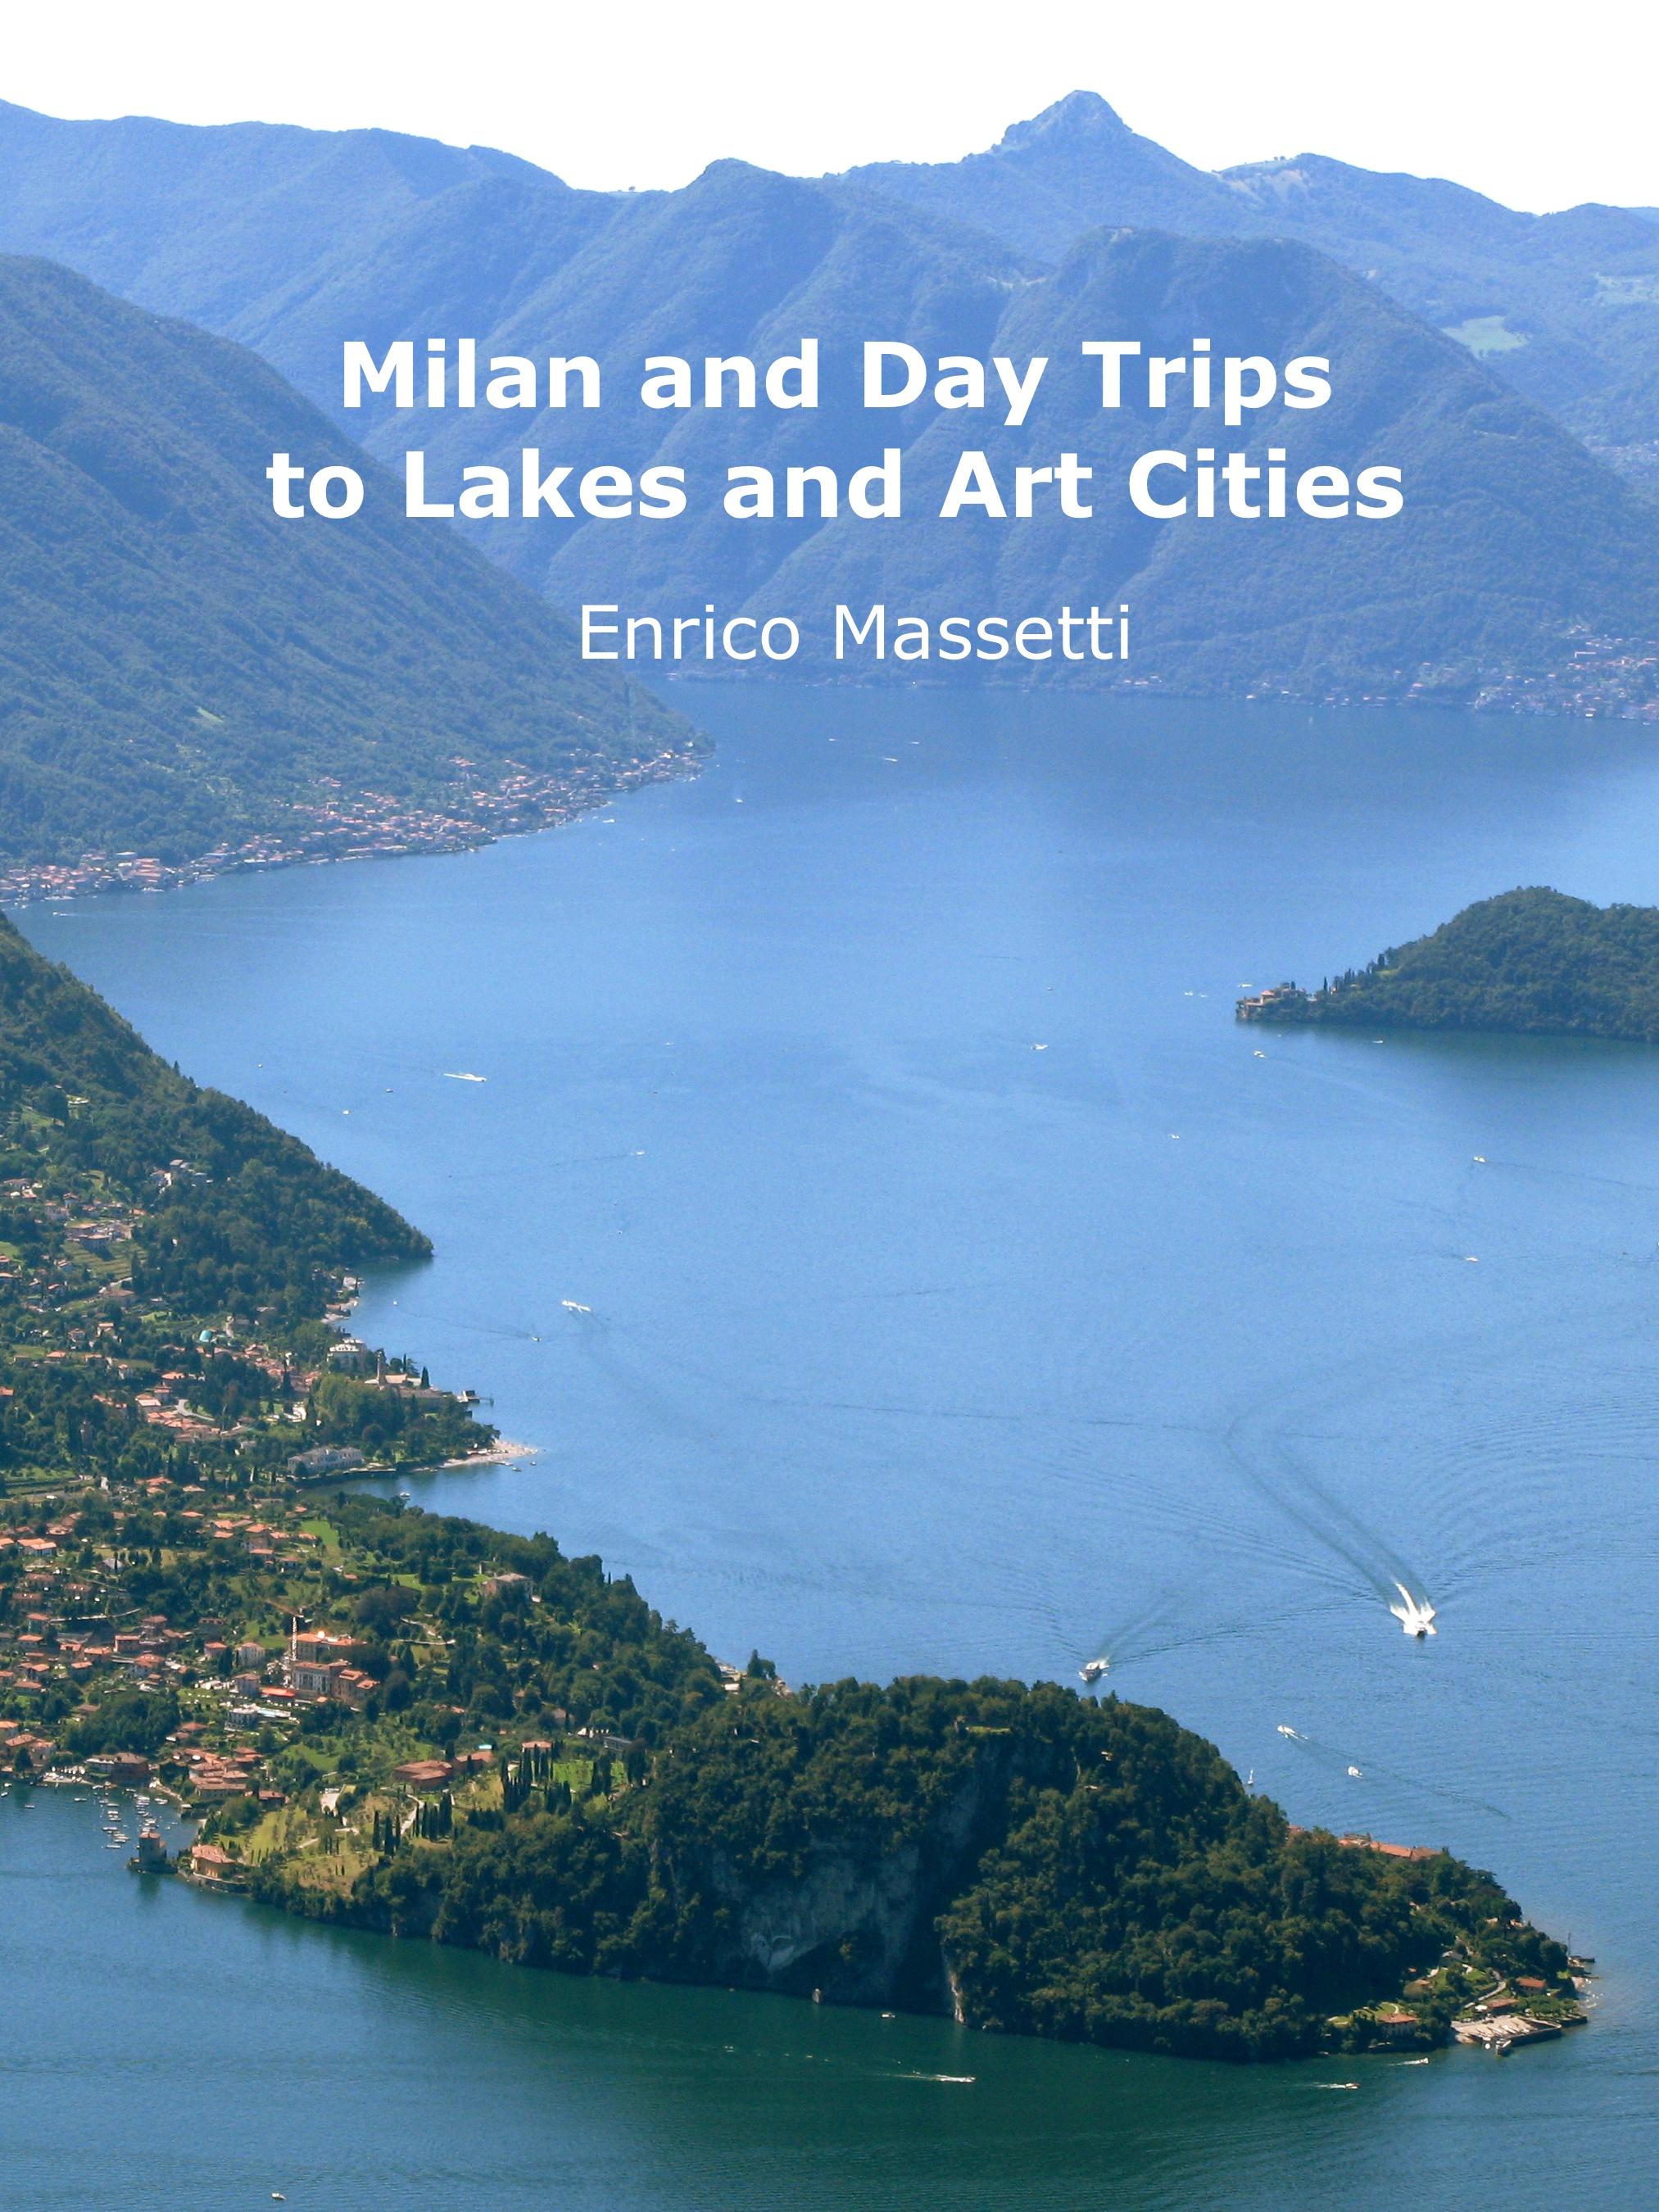 Milan and day trips - PDF